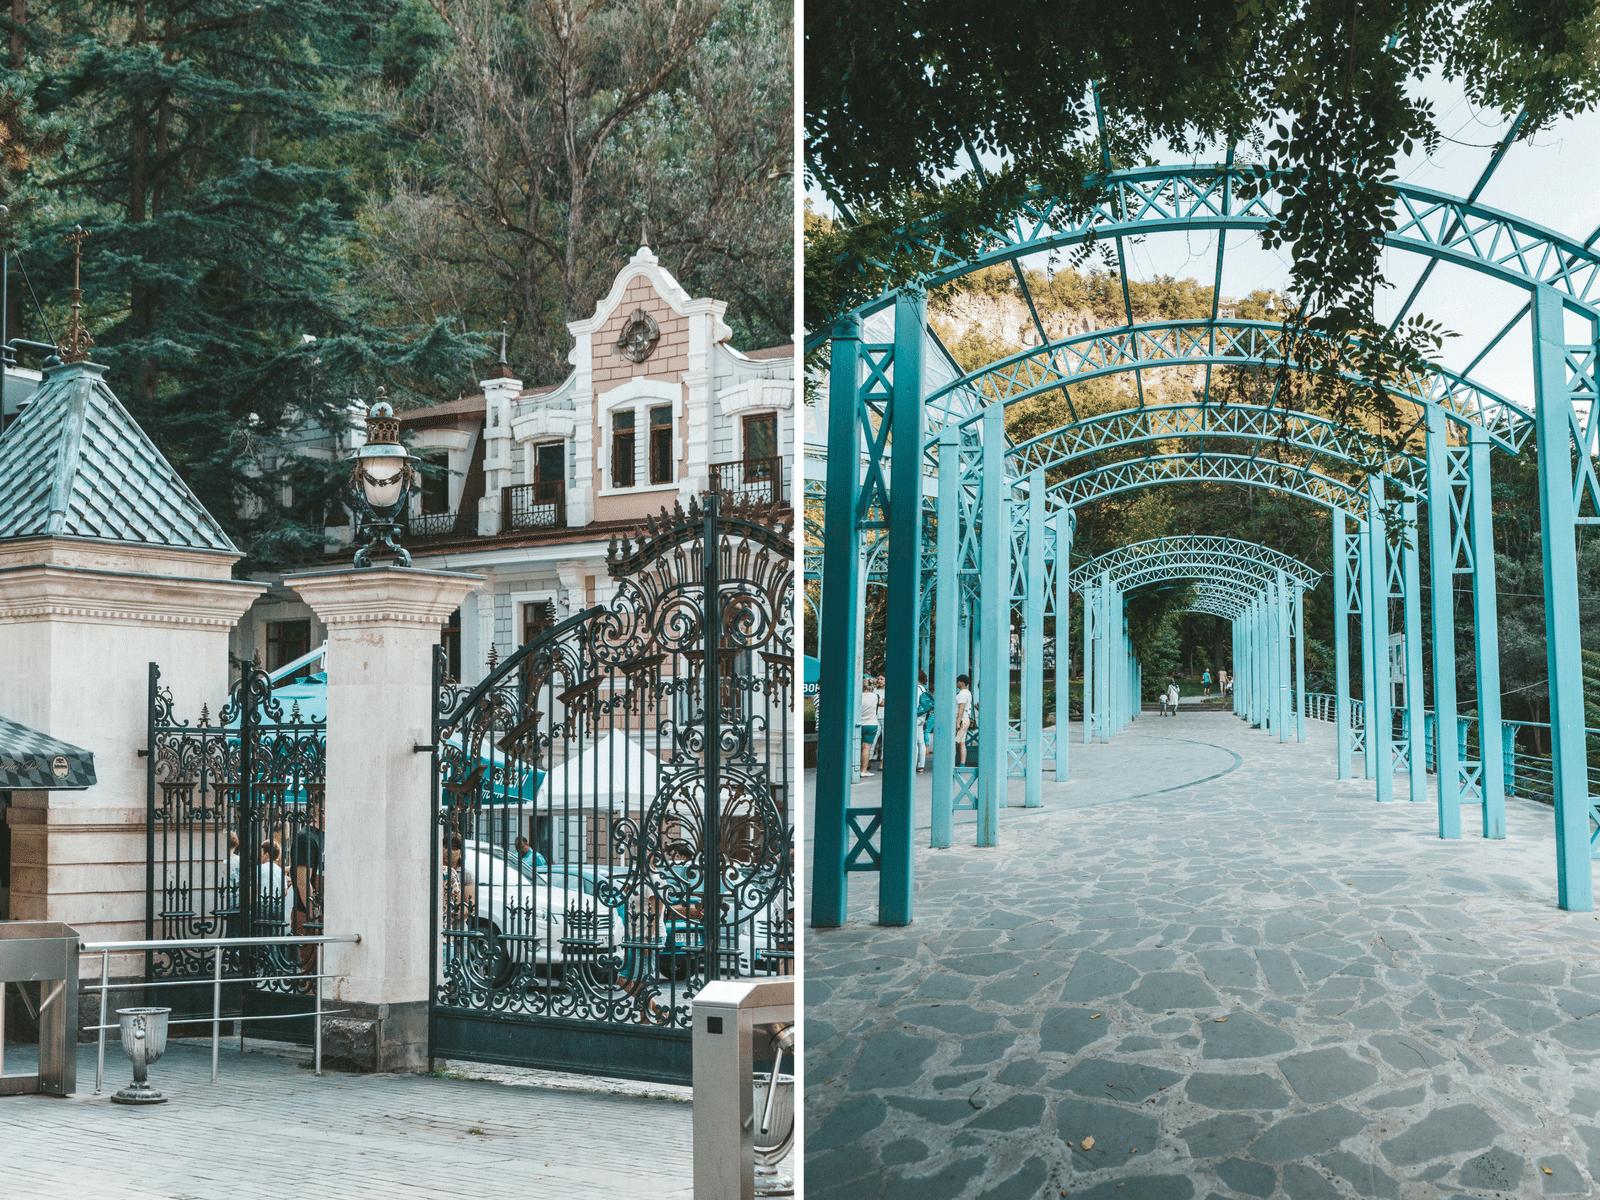 Rejse til Georgien, Tbilisi, Borjomi